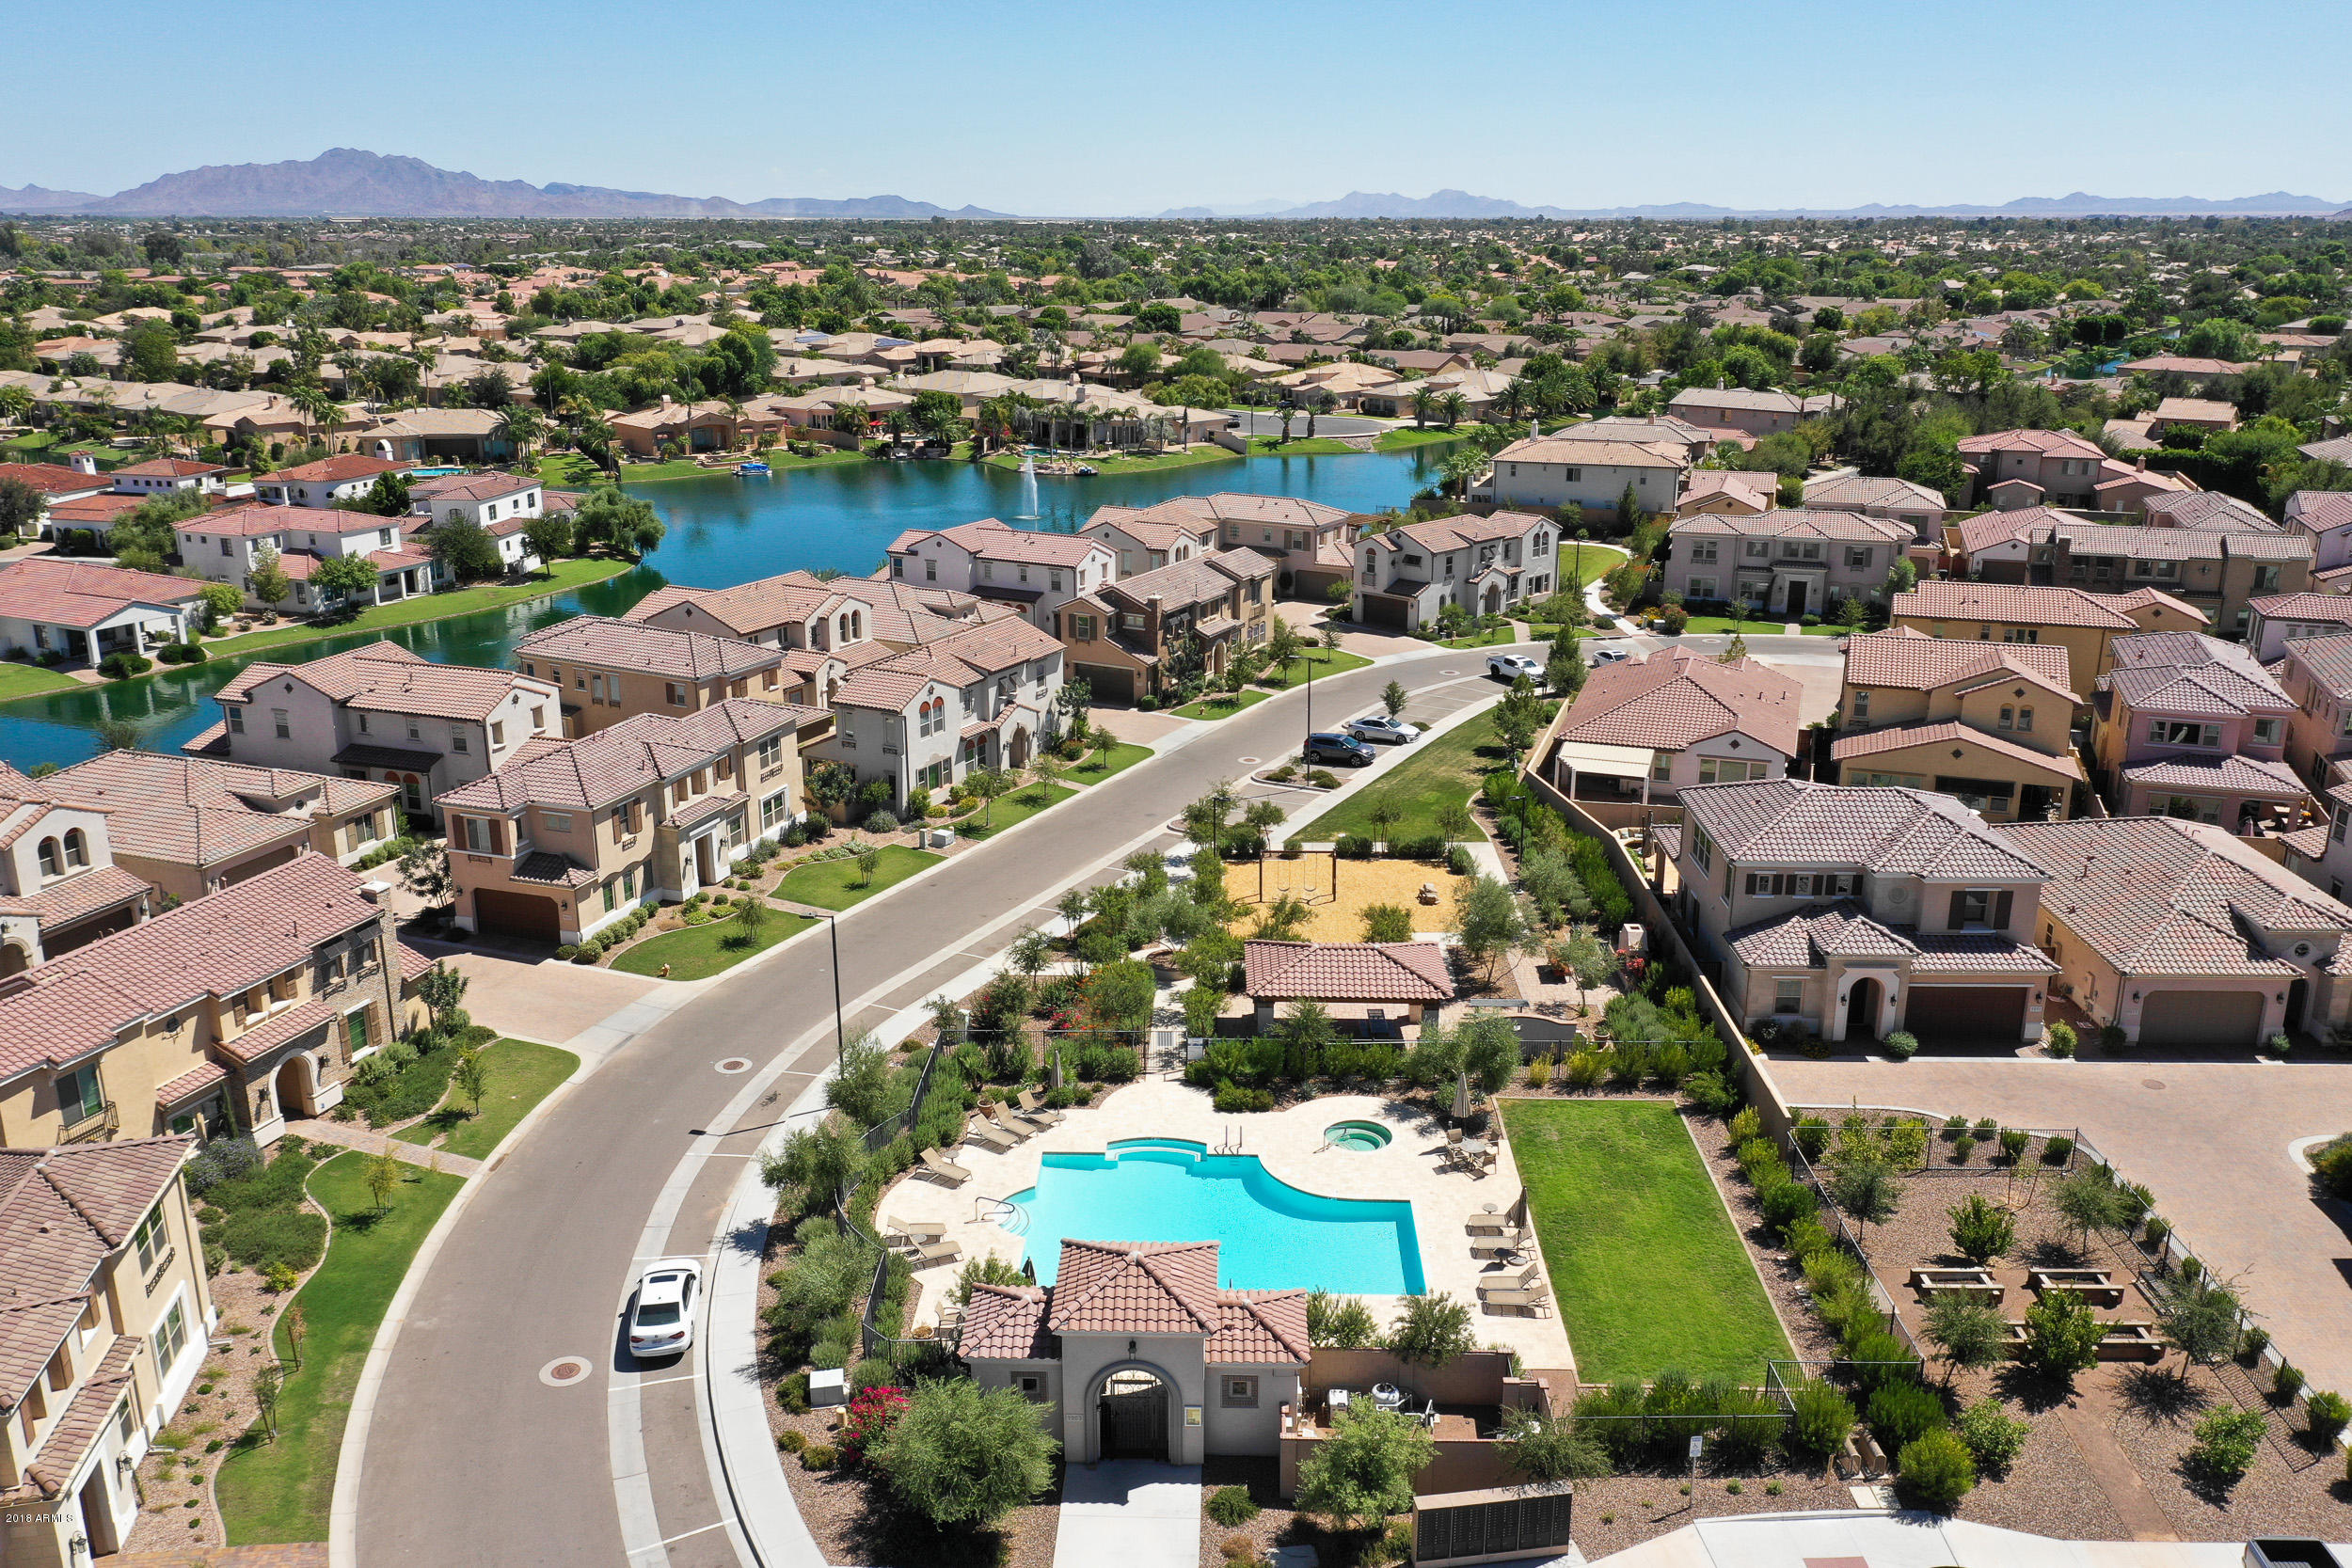 MLS 5823682 4143 S PECAN Drive, Chandler, AZ 85248 Community Pool